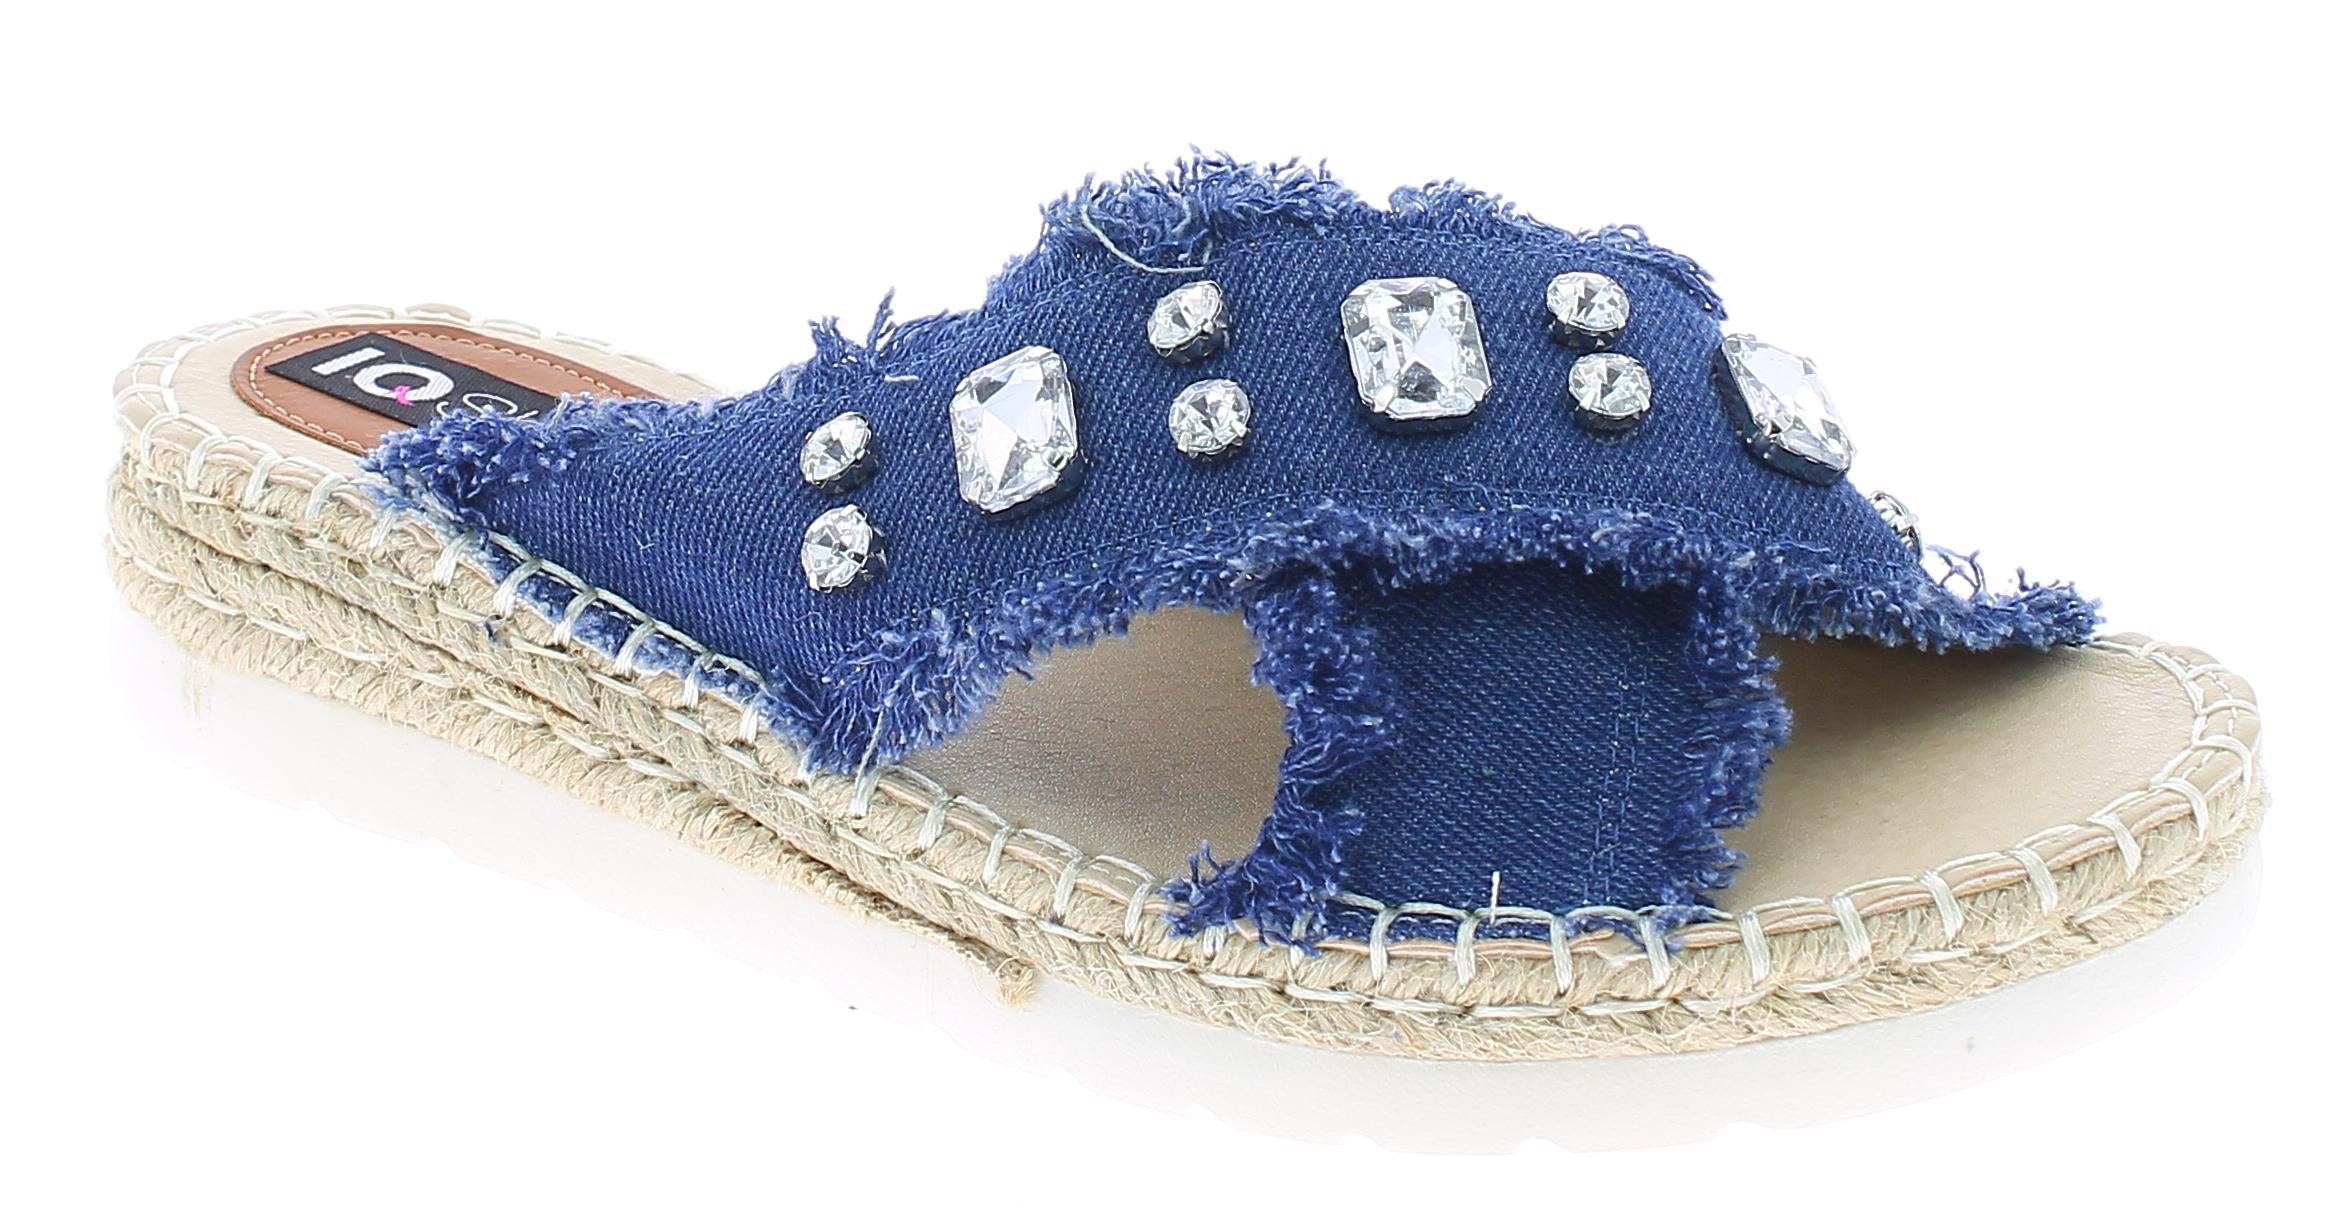 IQSHOES Γυναικεία Πλατφόρμα 17015 Μπλέ - IqShoes - 1701-5 BLUE-blue-36/1/23/7 παπούτσια  γυναικείες πλατφόρμες